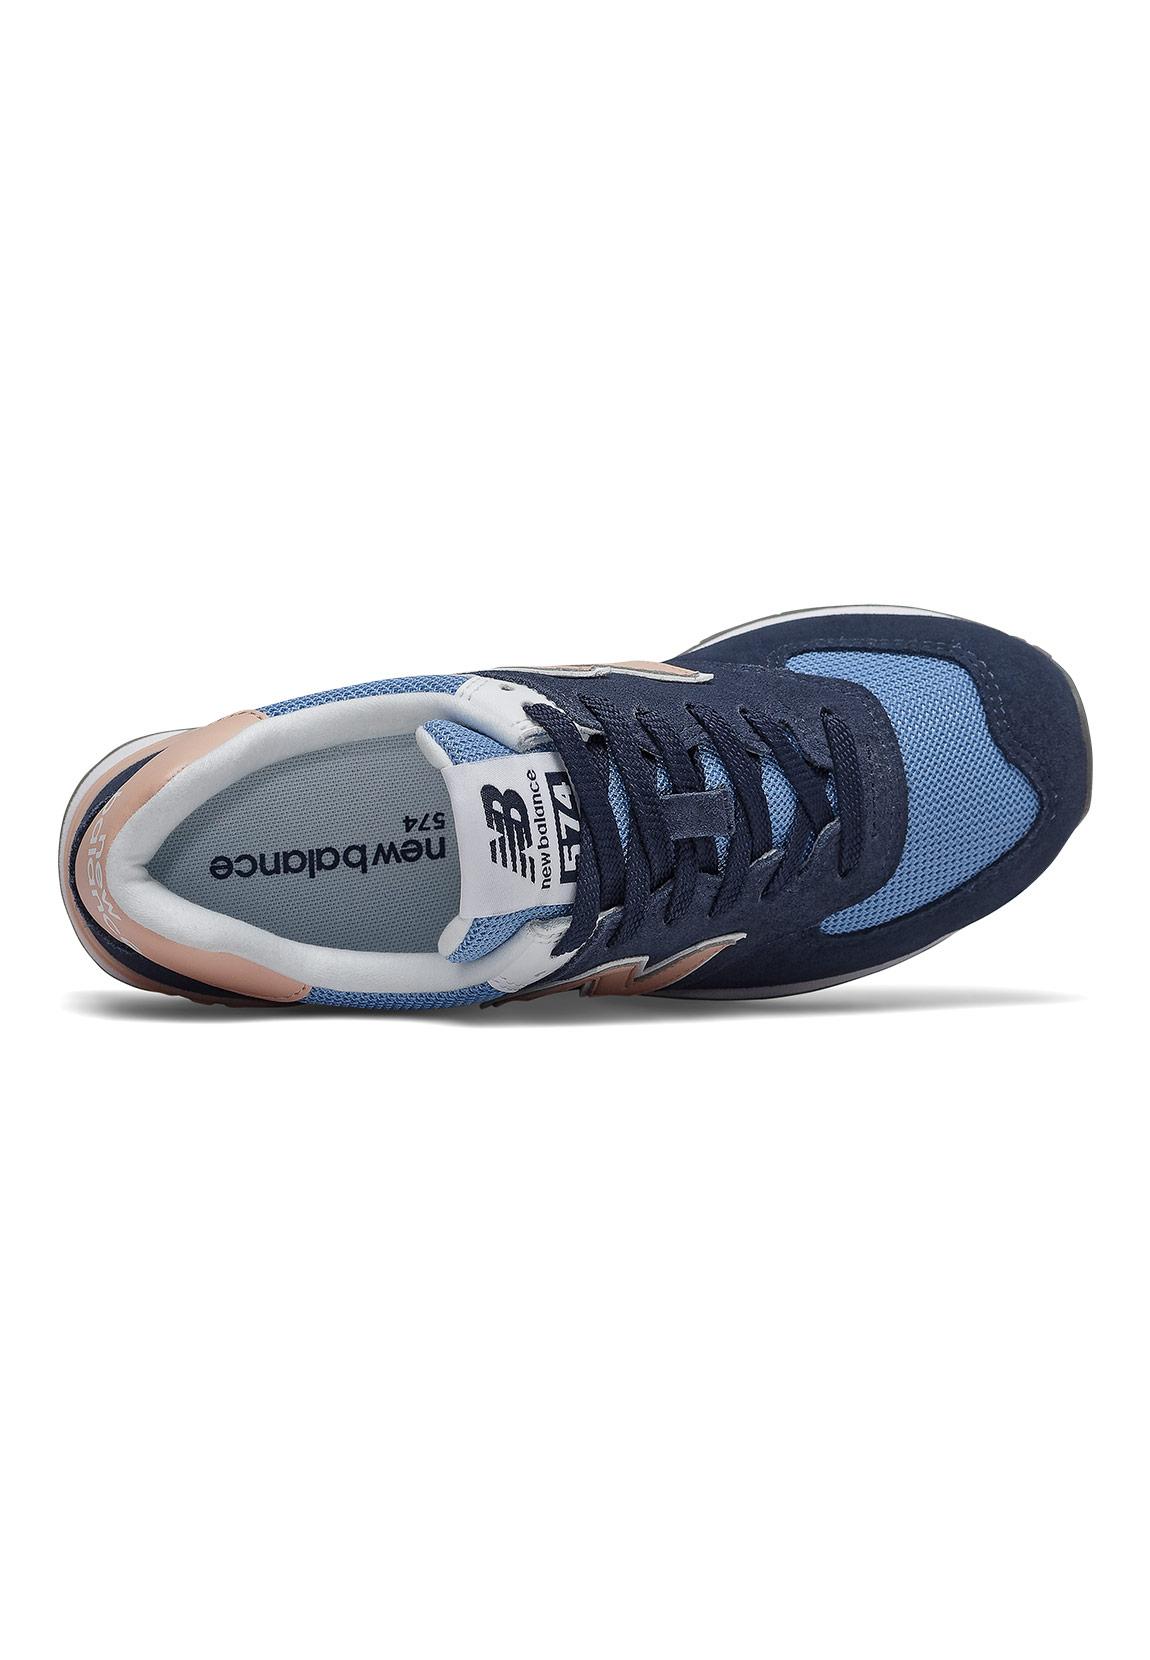 cheap for discount 658cb 6a126 New Balance Sneaker Damen WL574WND Mehrfarbig Navy Pink